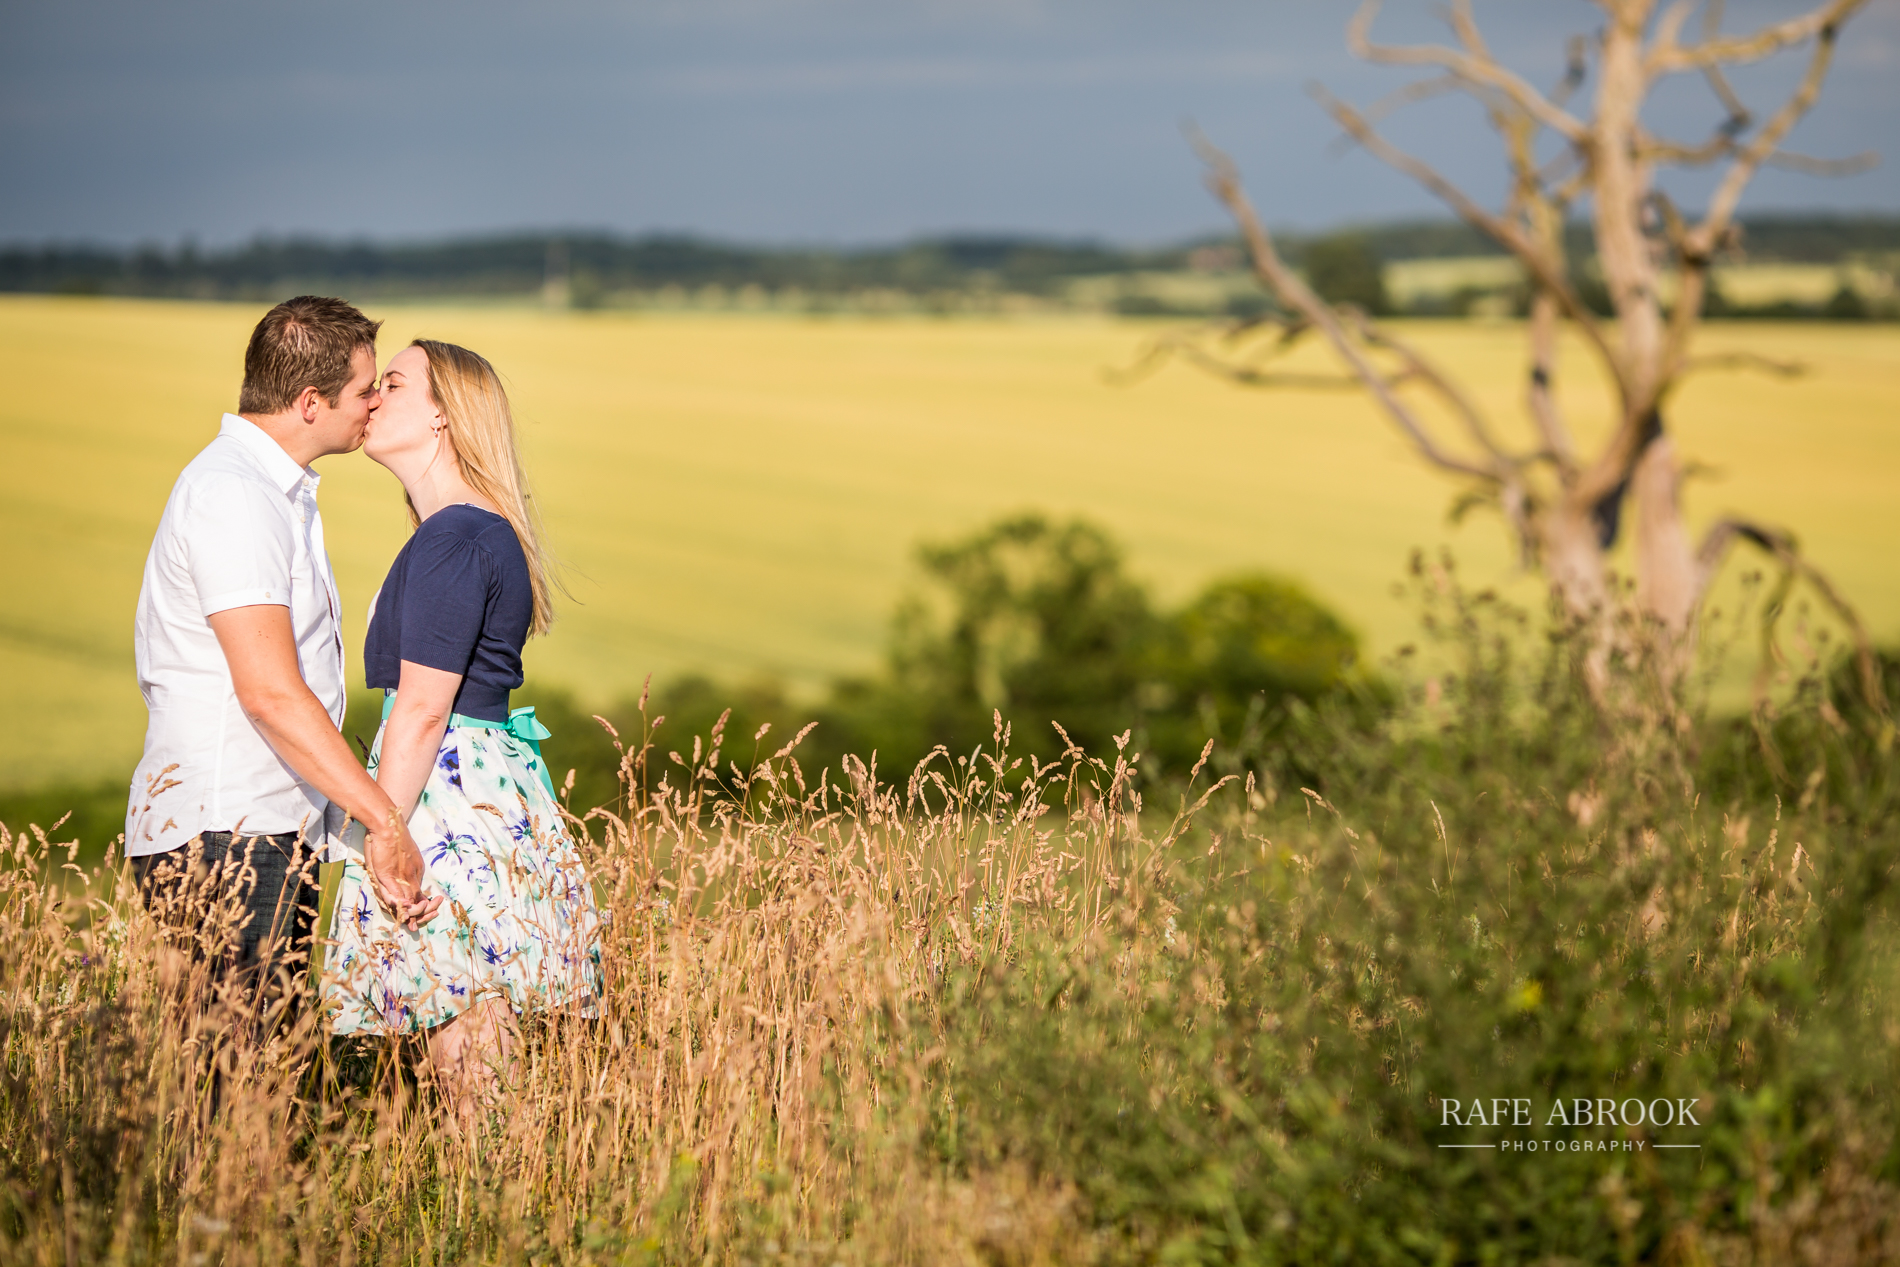 melanie & graham engagement shoot great ashby district park stevenage hertfordshire-1002.jpg